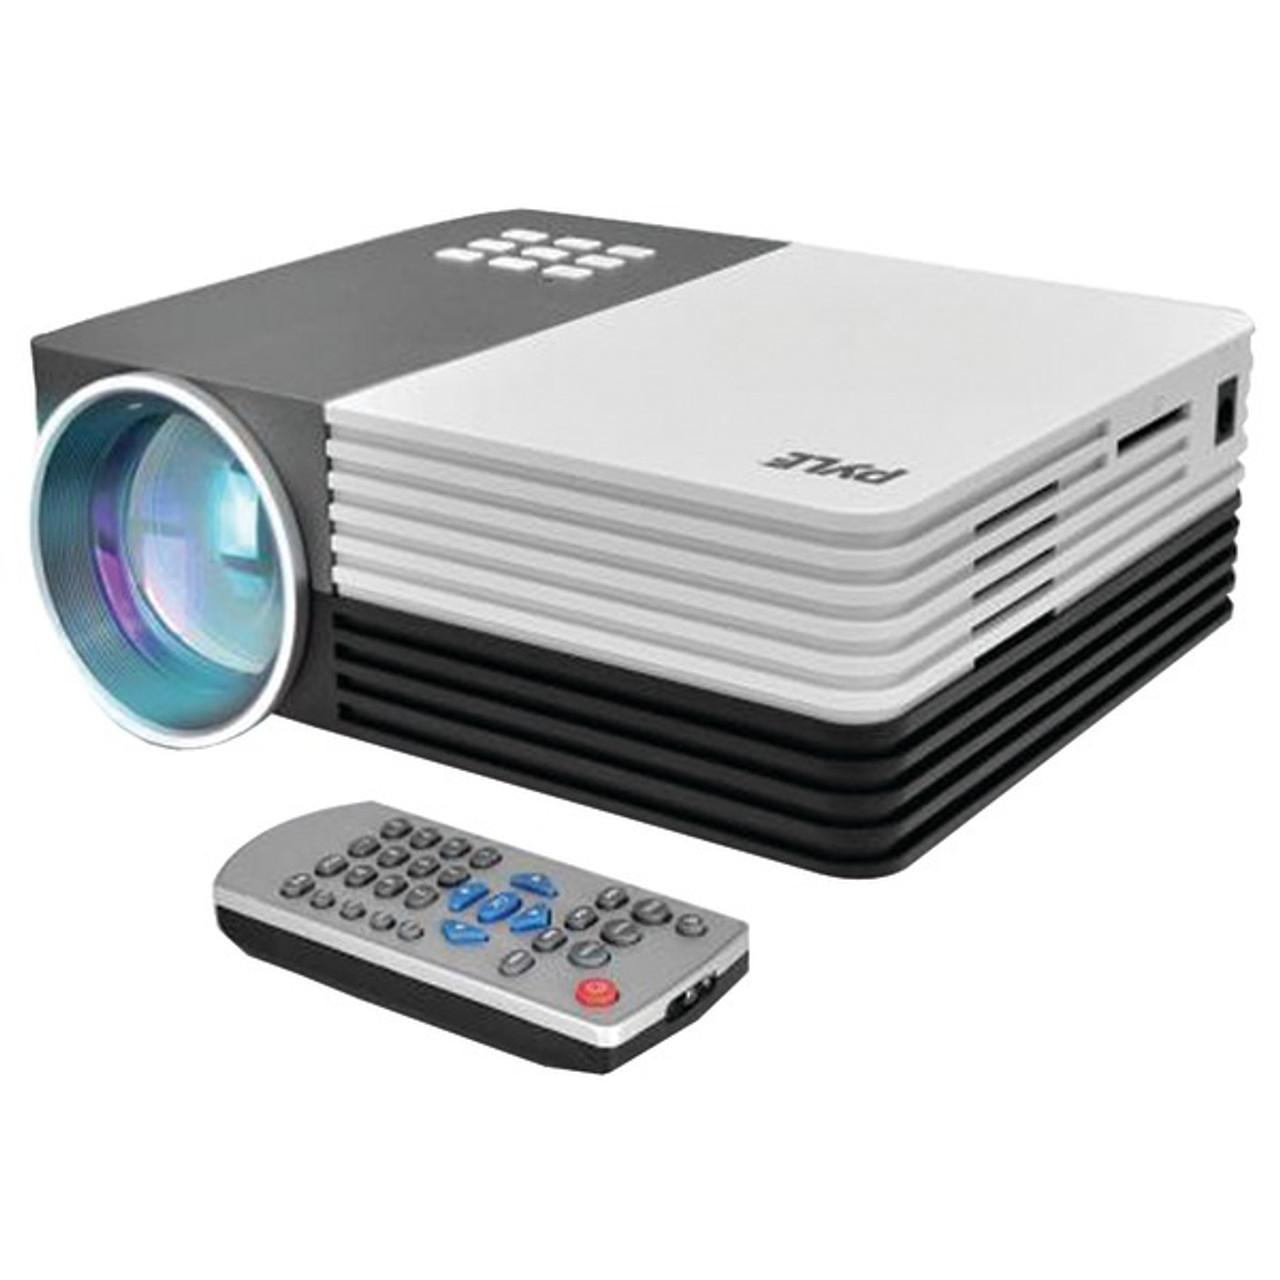 NEW Pyle PRJG48 Pocket Projector 1080p Support USB//SD Readers  HDMI /& VGA Inputs